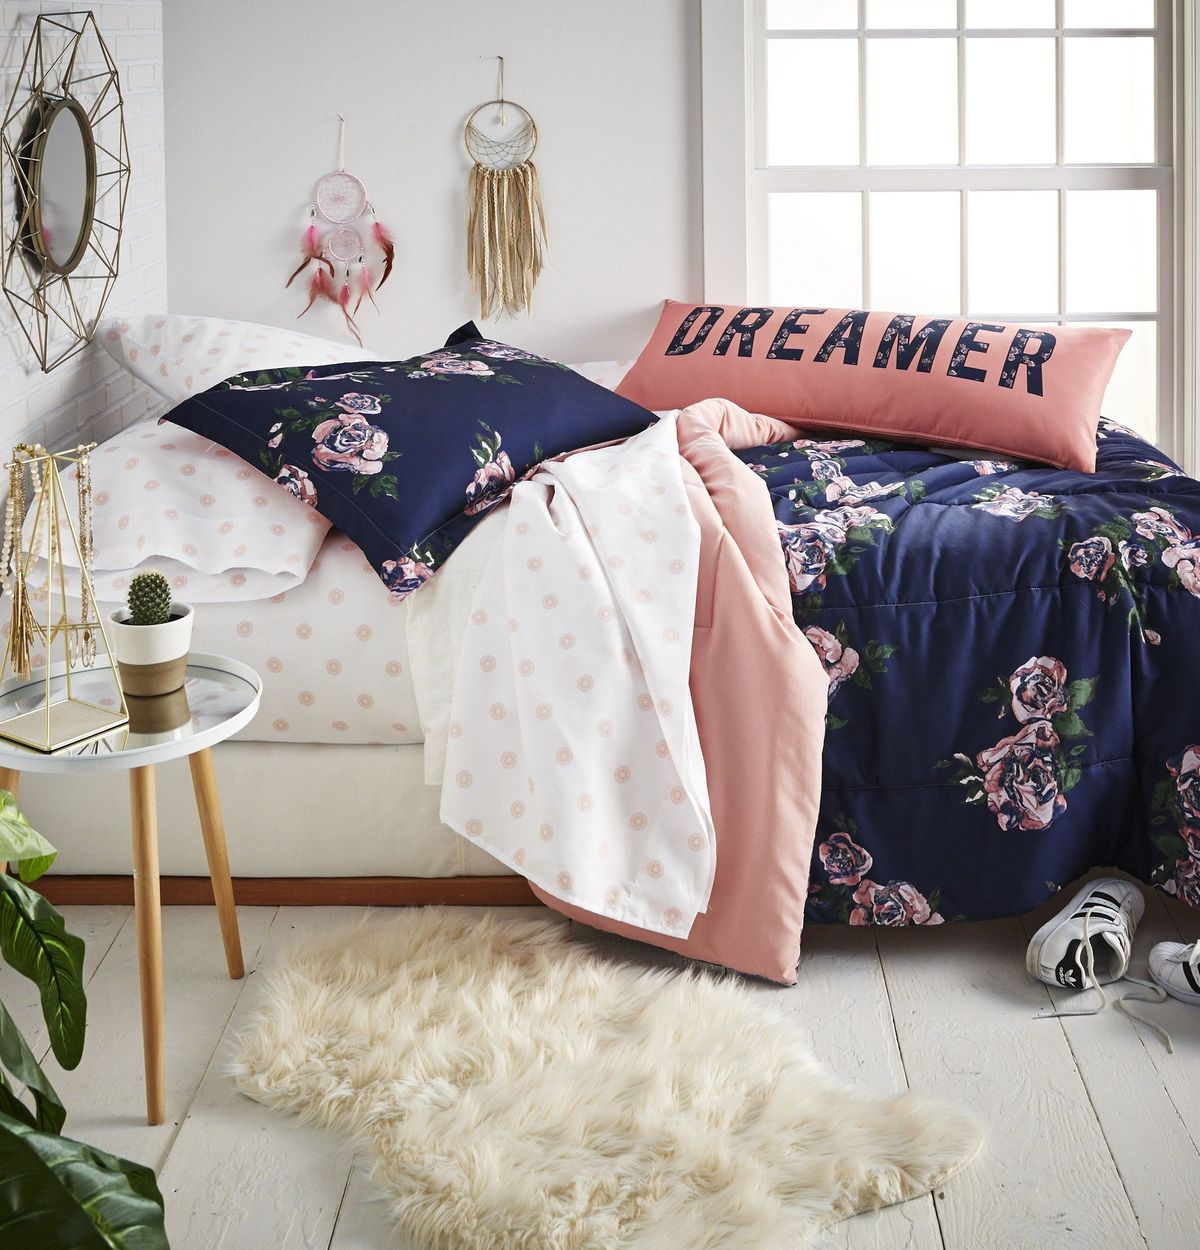 Roomify Sweet_Dreams_Room_Shot_1200x1250_crop_center.jpg